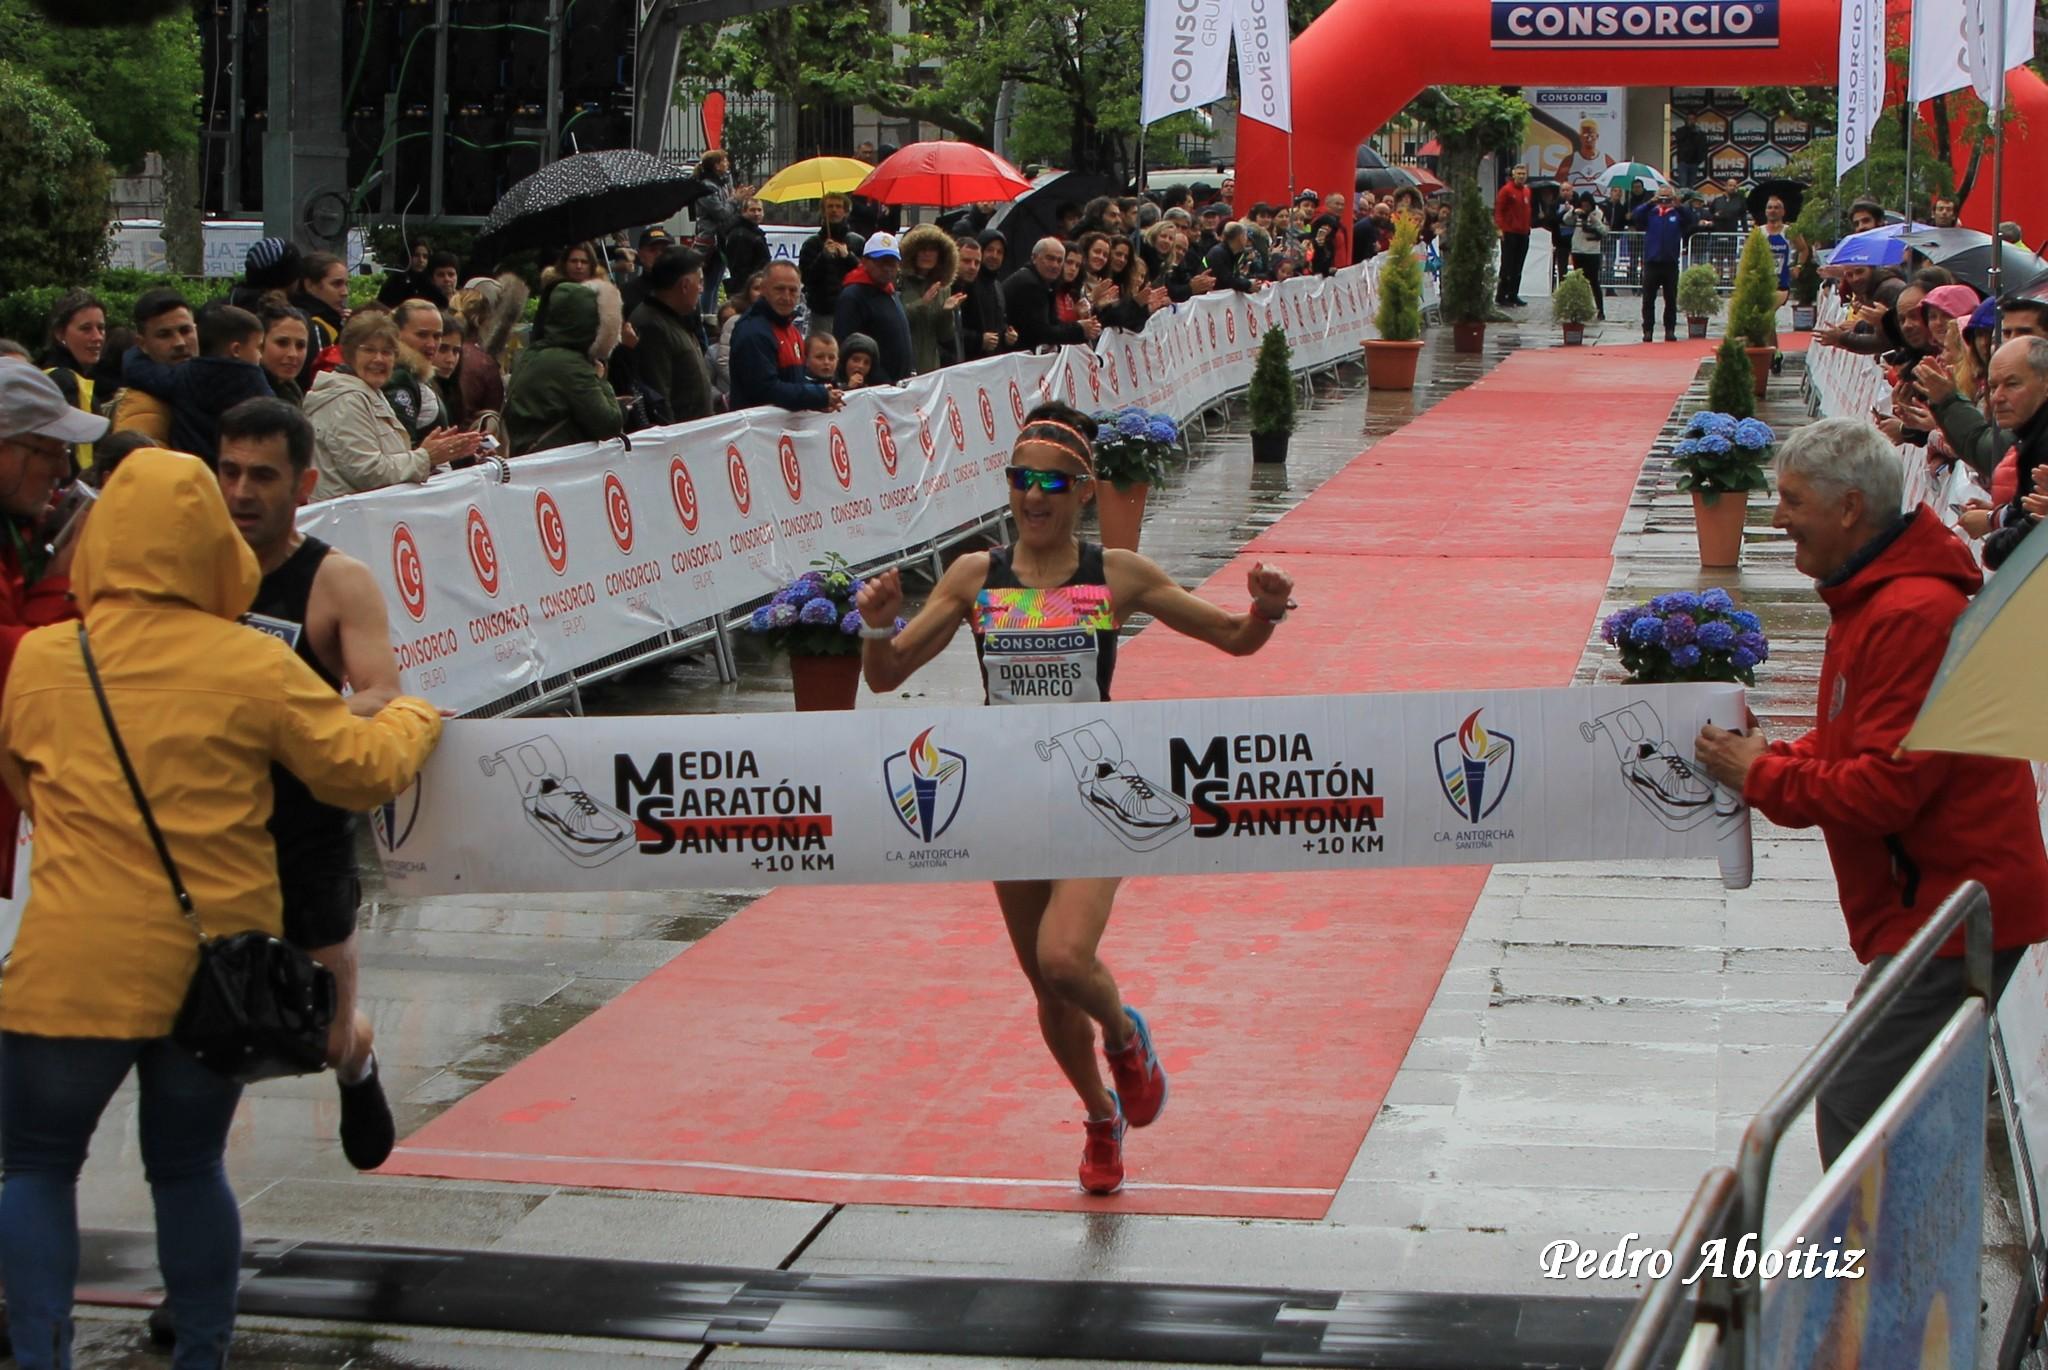 2019-05-19 XXII Media Maratón de Santoña + 10 Km 1084